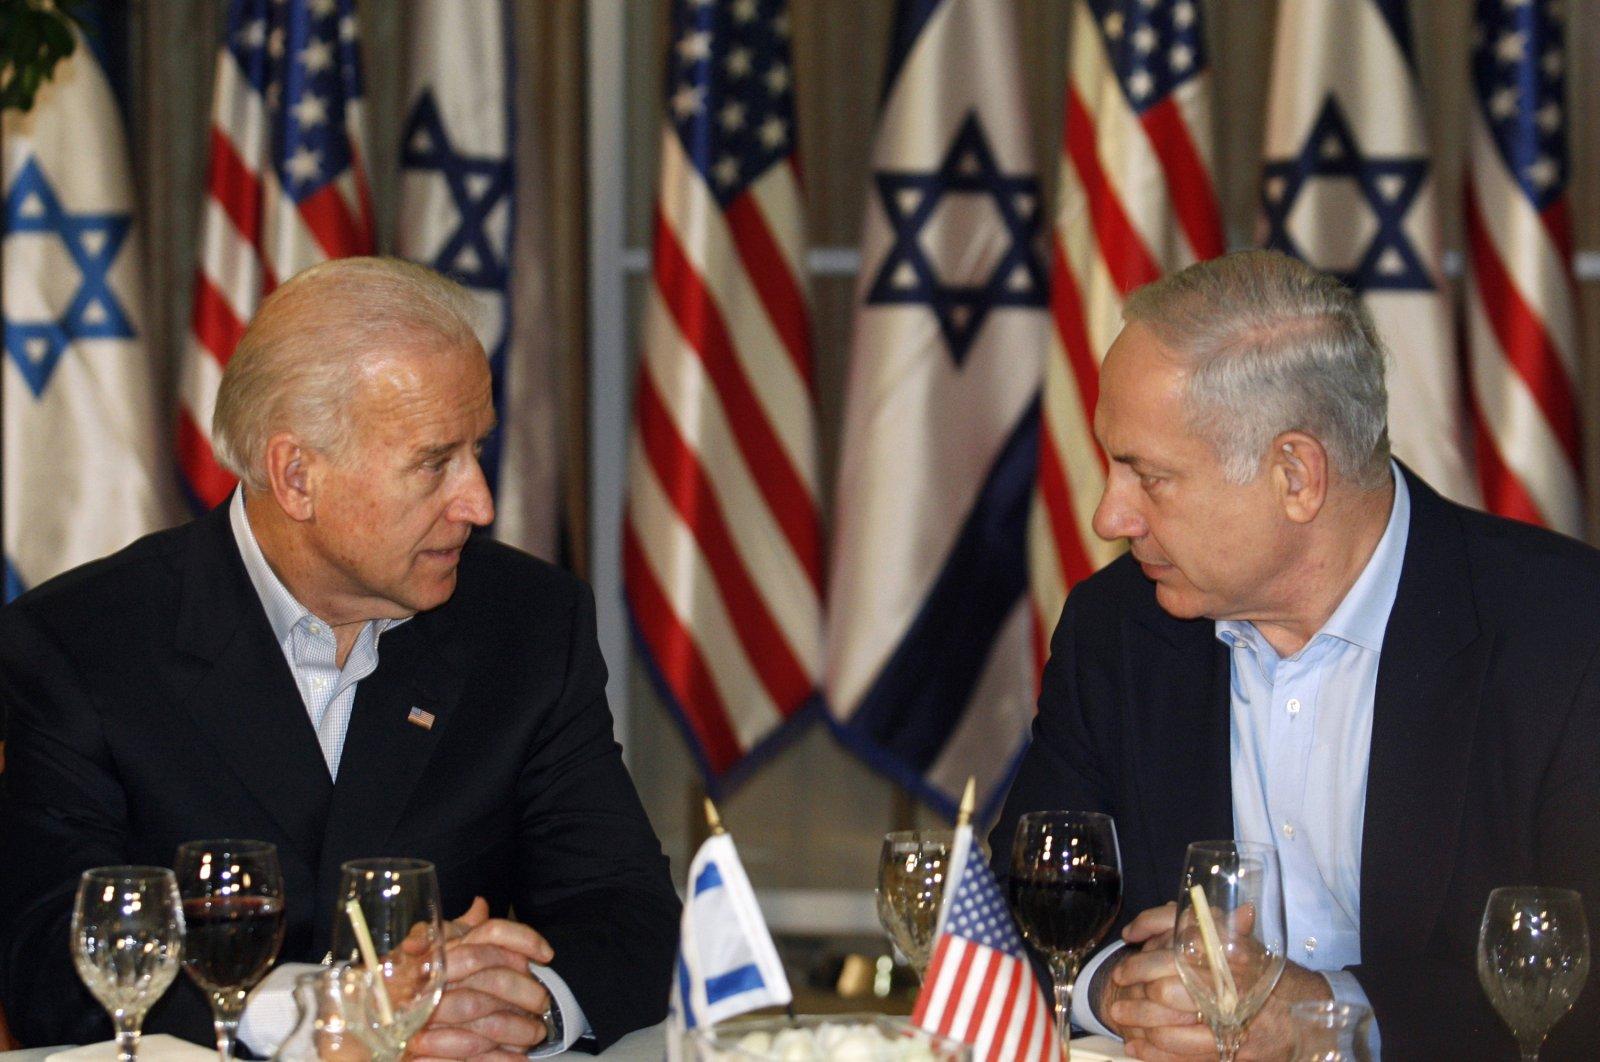 Then U.S. Vice President Joe Biden (L) and Israeli Prime Minister Benjamin Netanyahu talk while having dinner at Netanyahu's residence in western Jerusalem, March 9, 2010. (AP Photo)